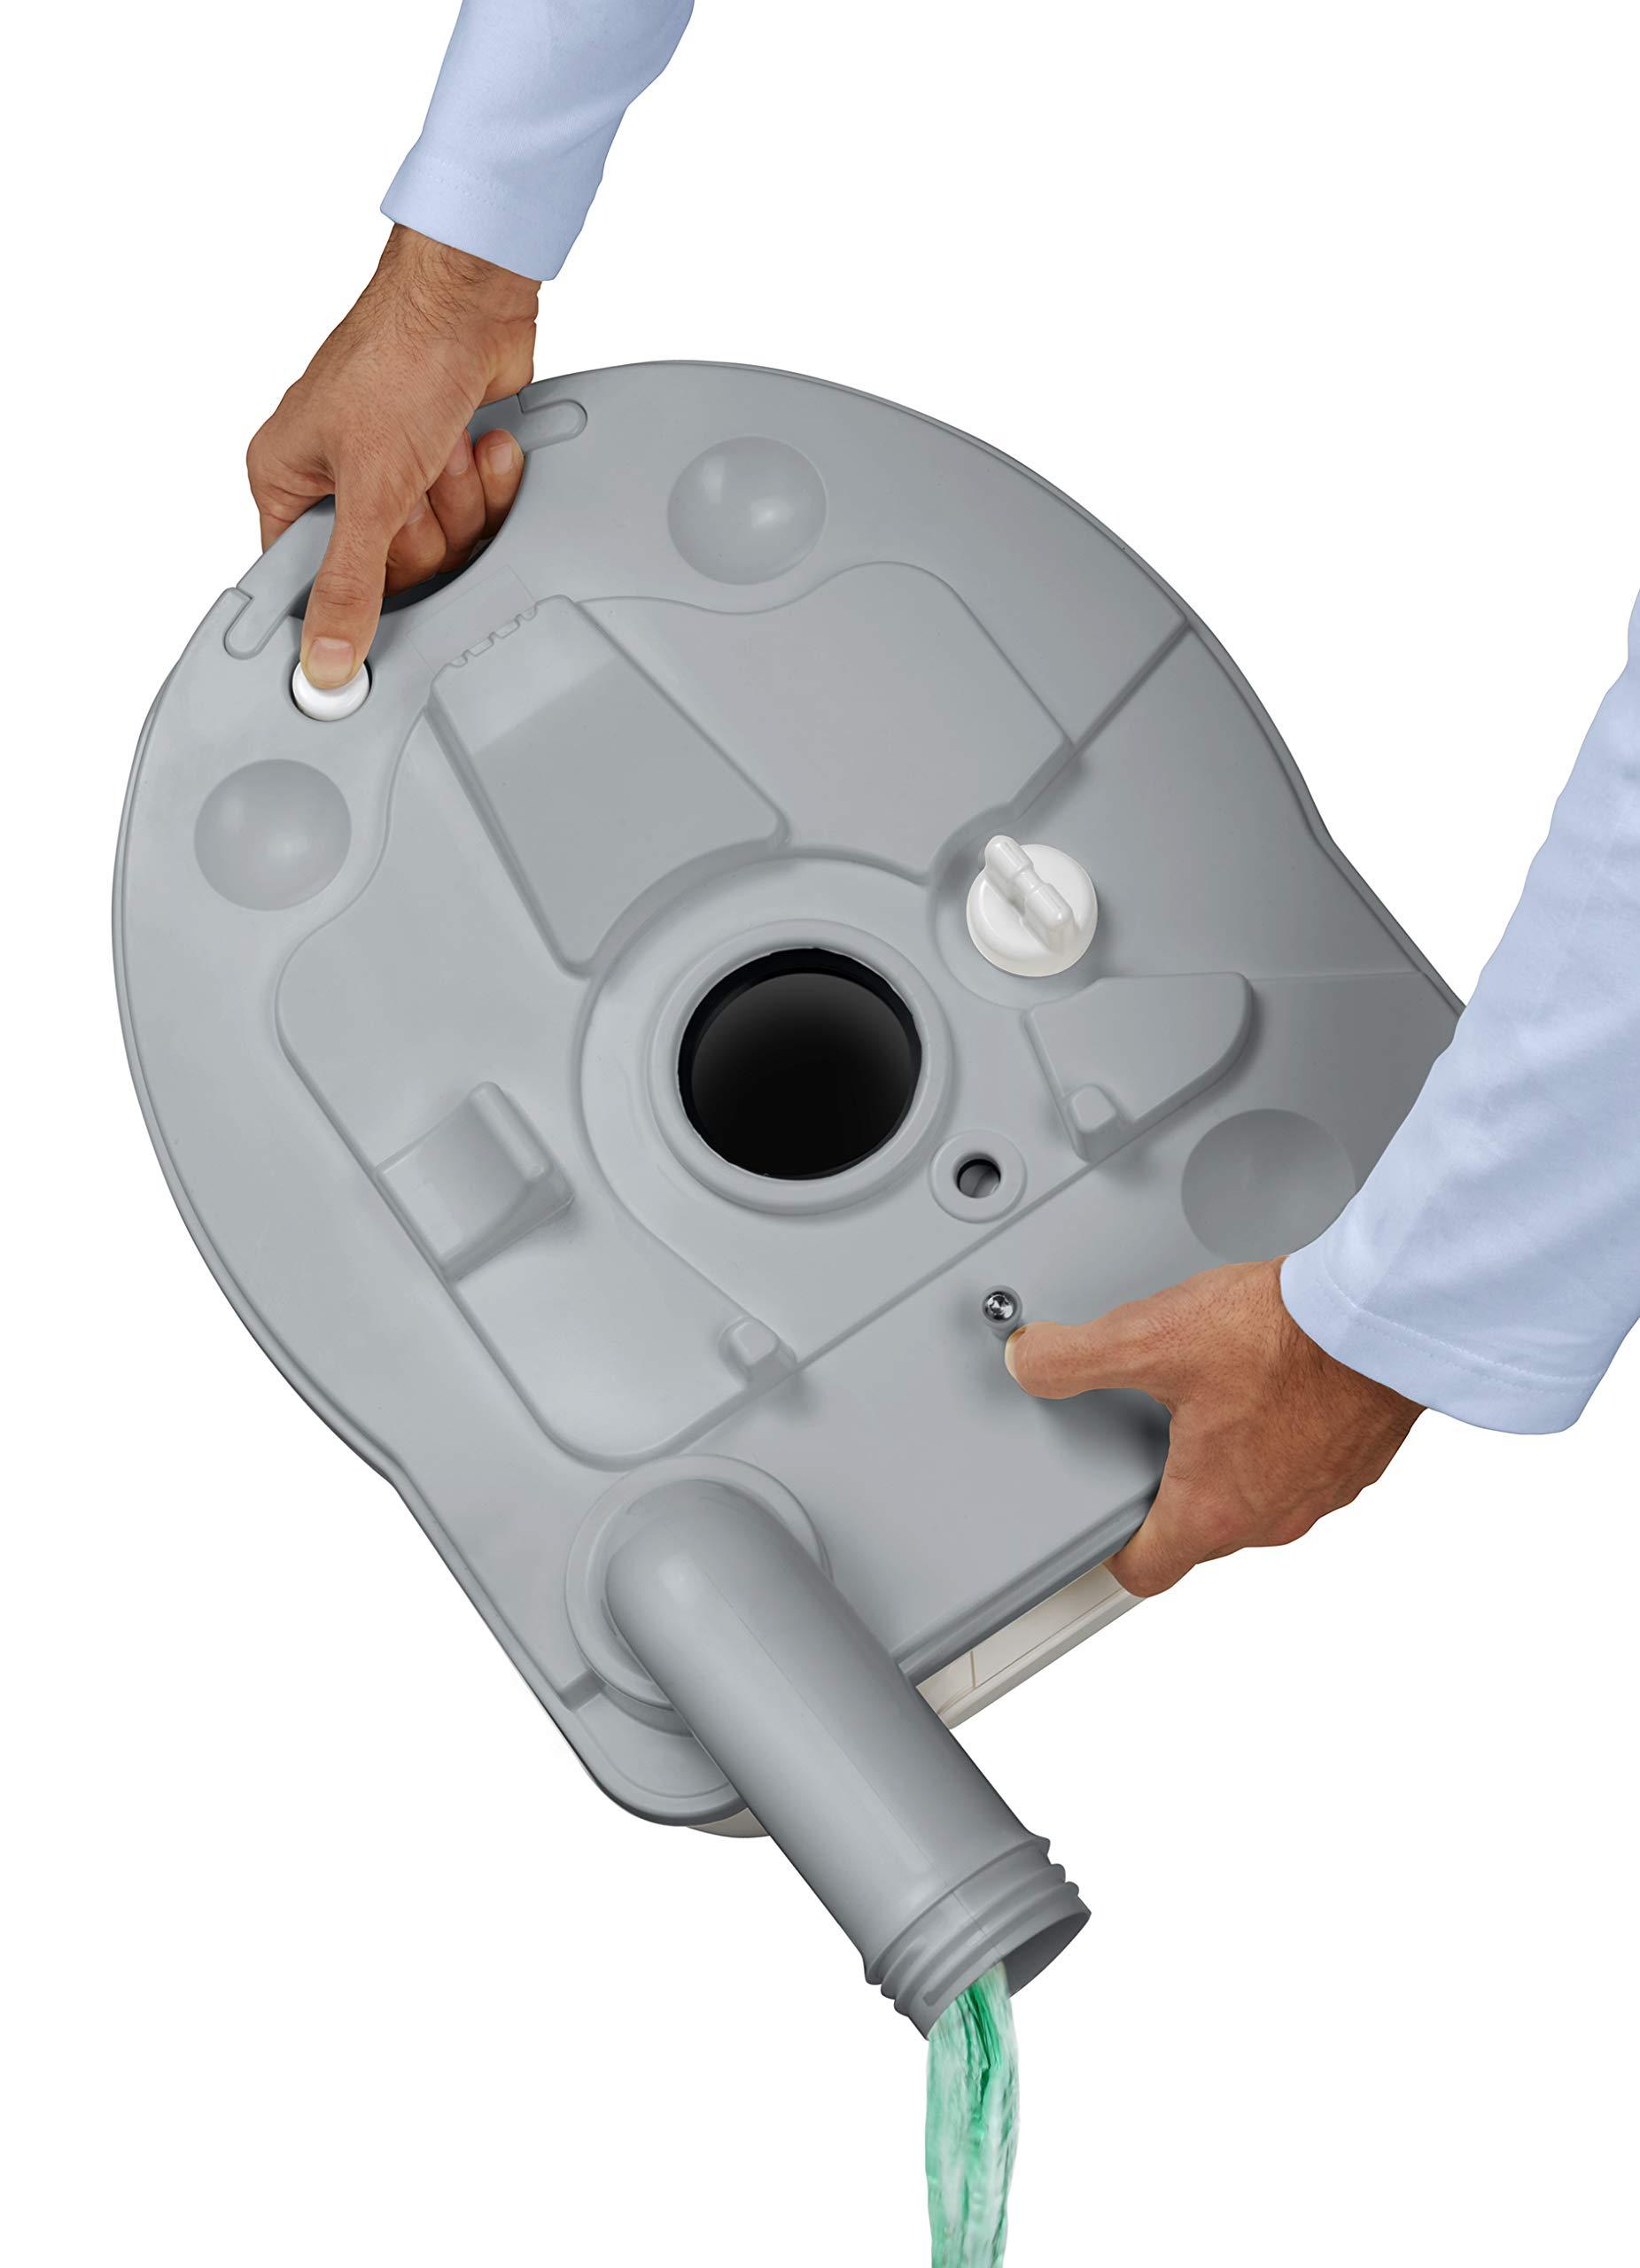 Thetford 92305 Porta Potti 565P Excellence Portable Toilet (Manual), 448 x 388 x 450 mm 16